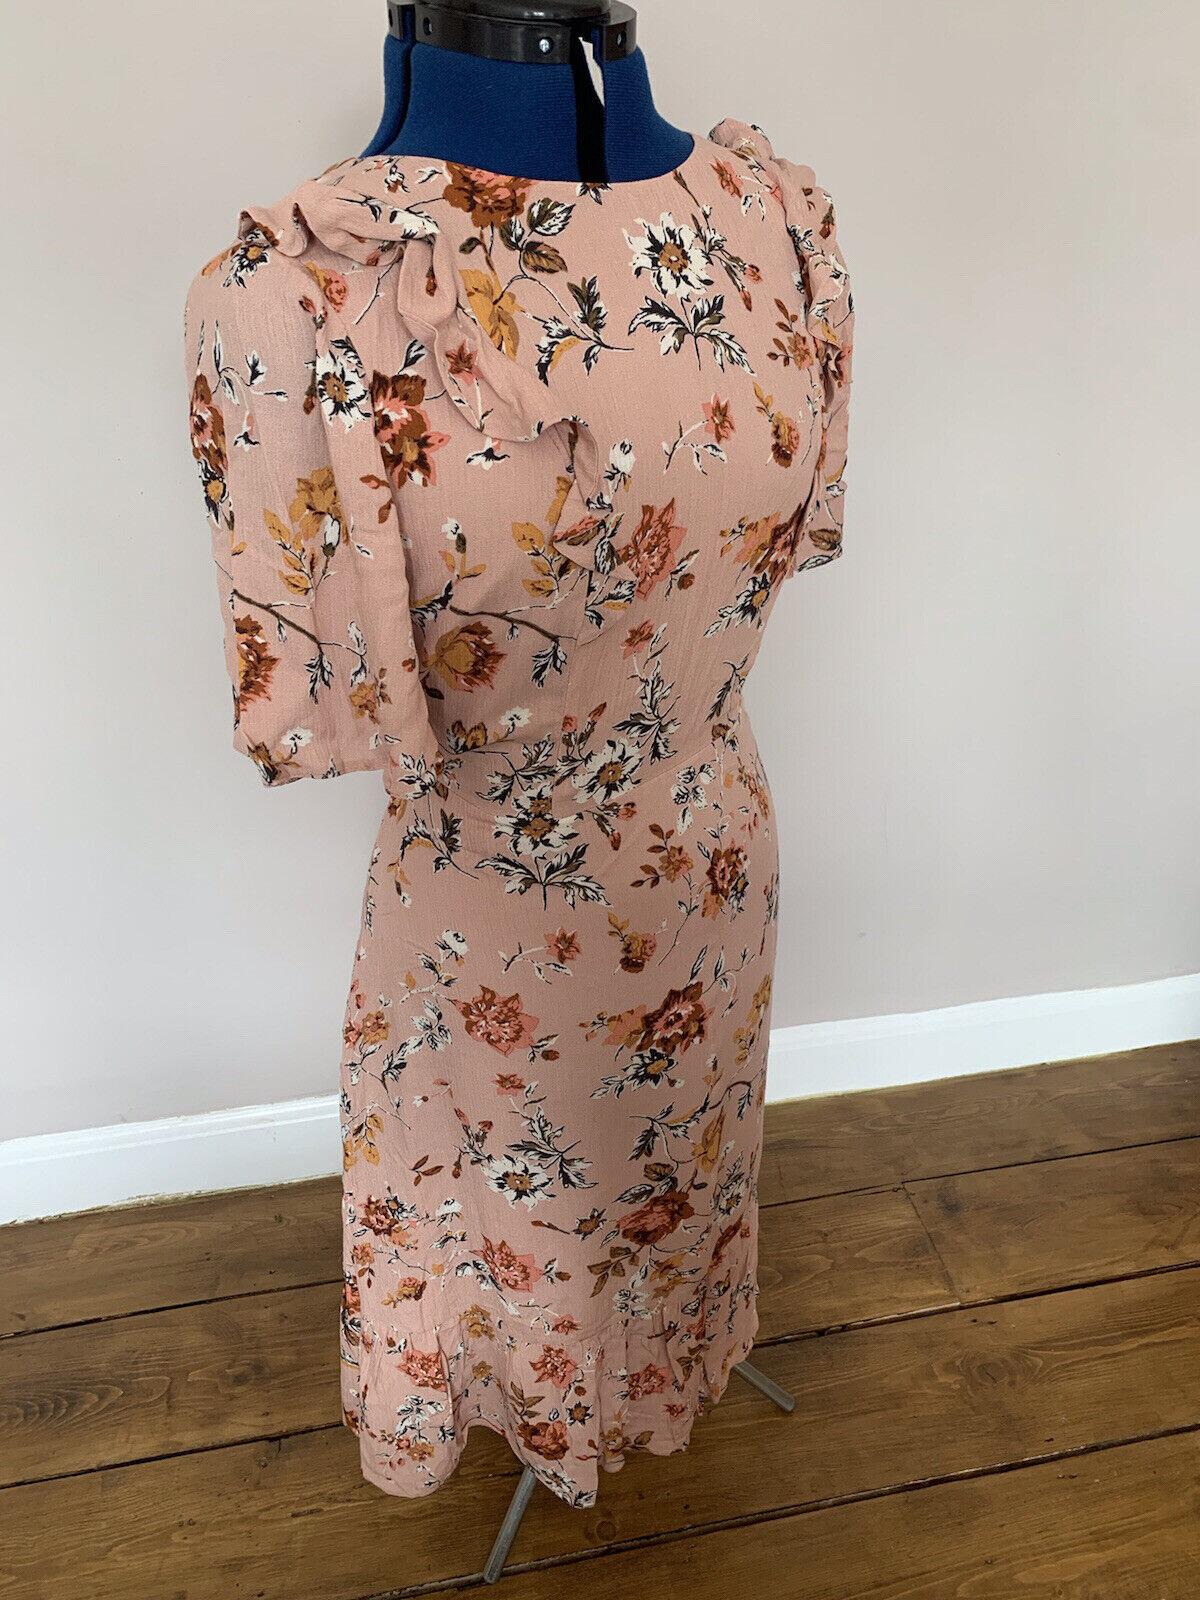 *Laura Ashley* Vintage Pink Light Summer Cotton Floral Dress Size 12